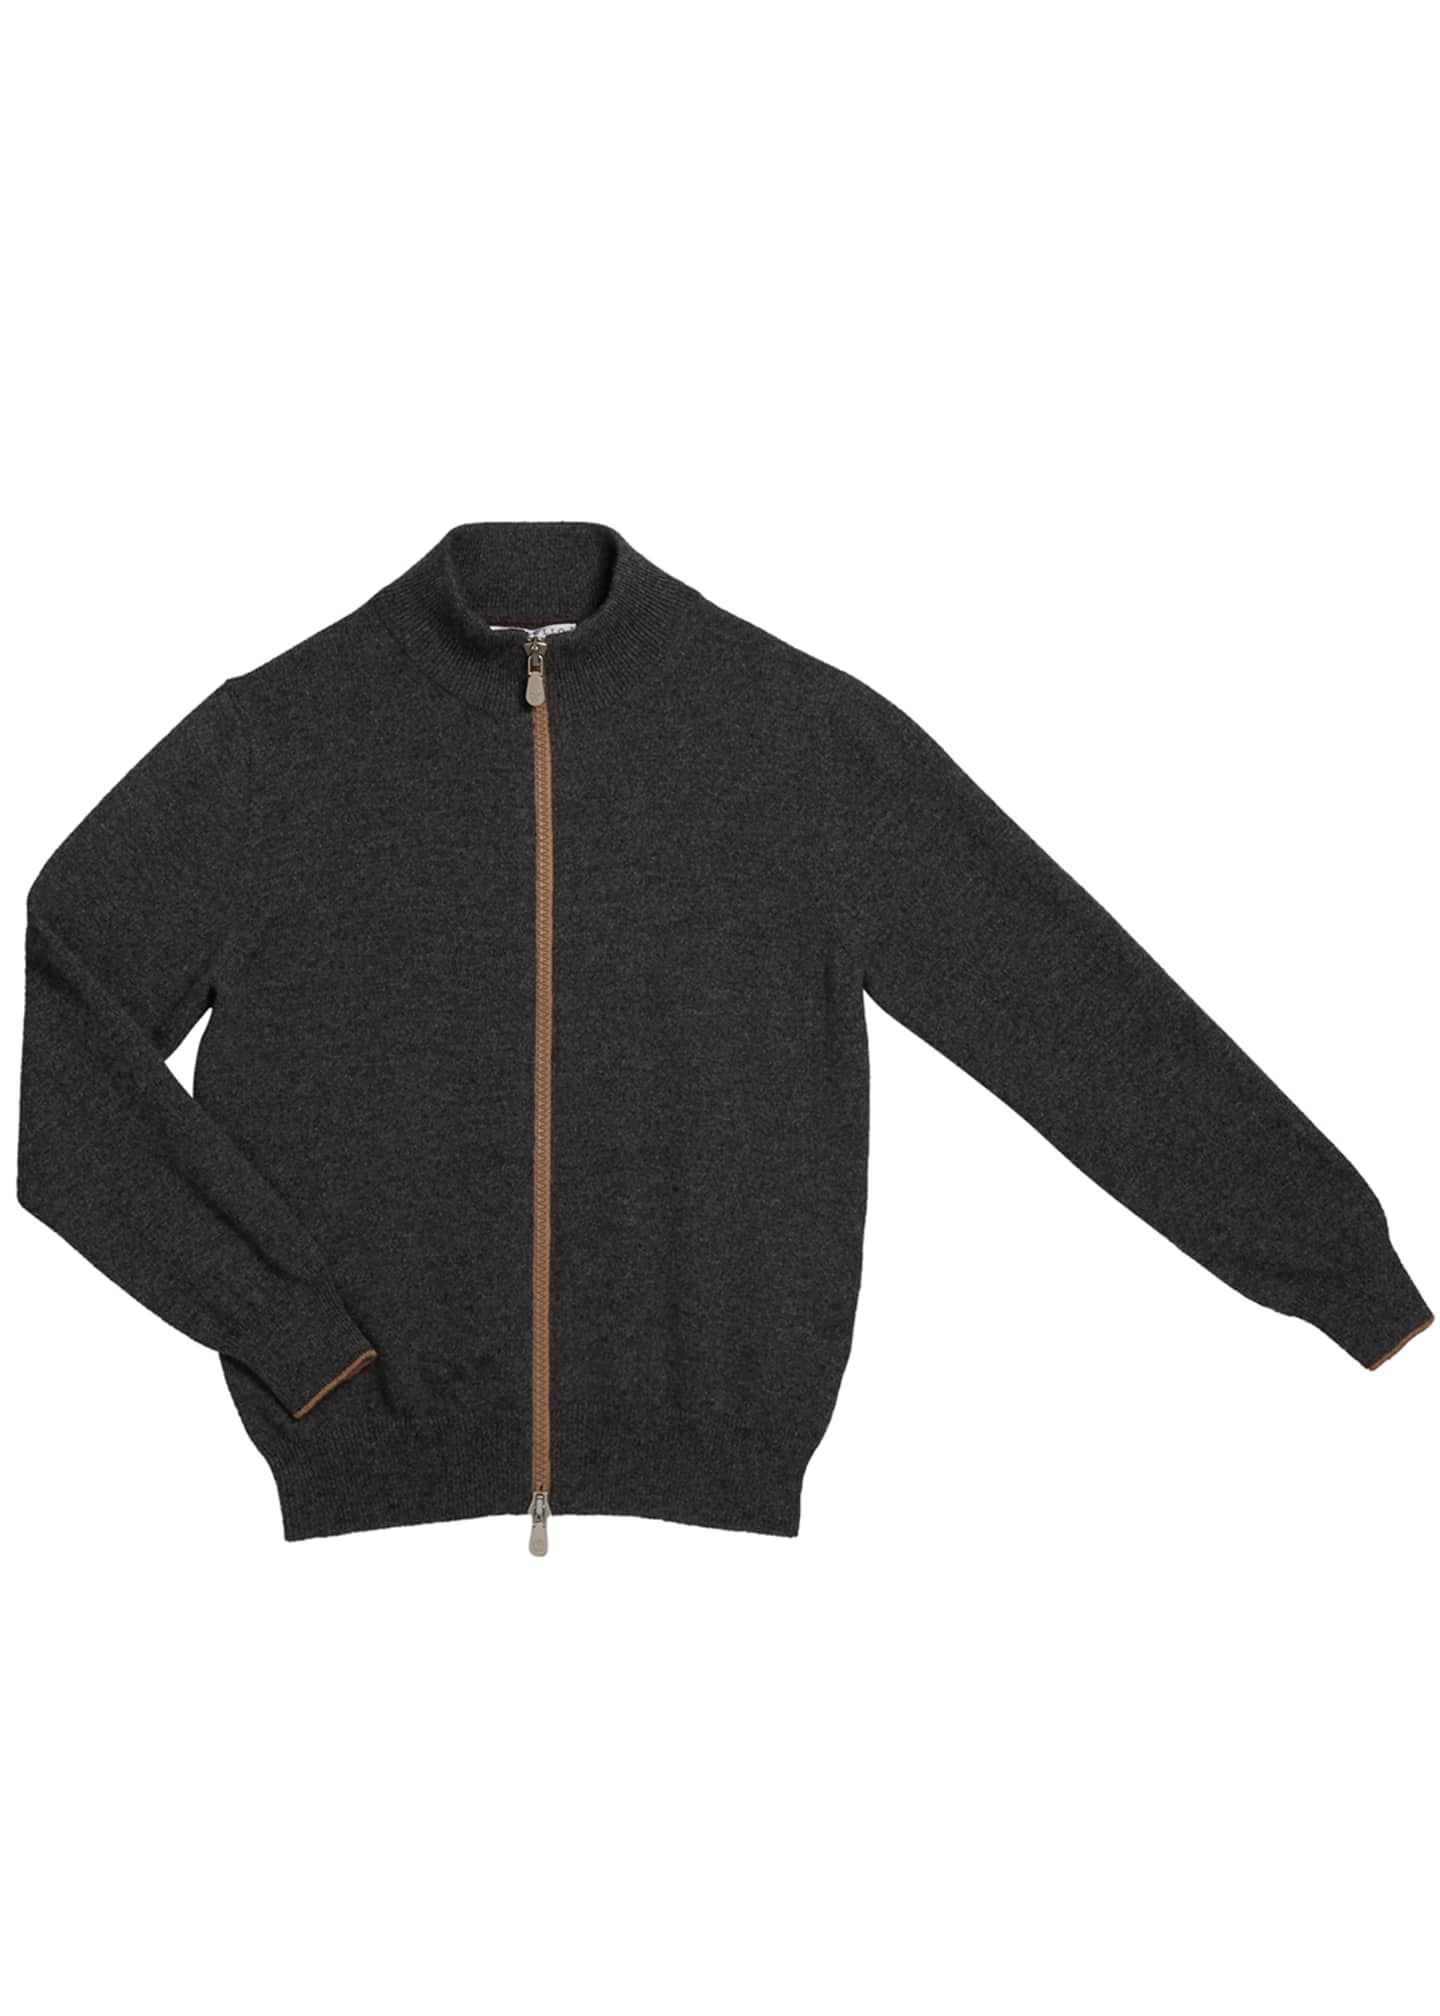 Brunello Cucinelli Boy's Zip-Front Cashmere Cardigan, Size 4-6